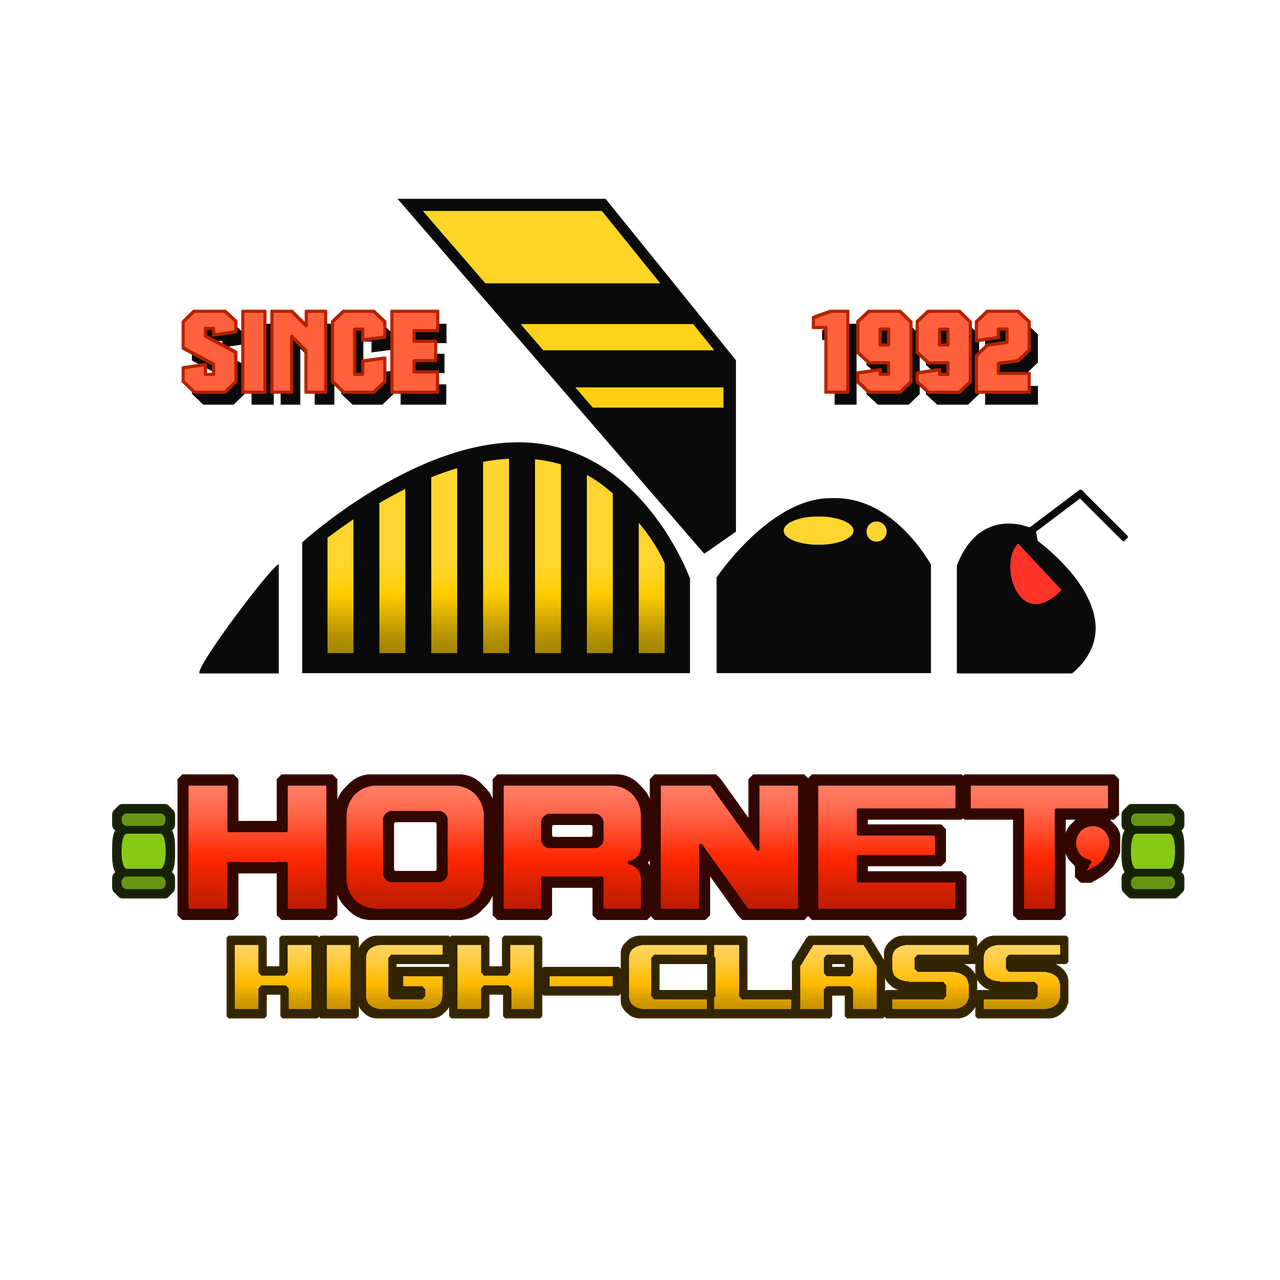 daytona_usa_hd_texture_2019___hornet_log